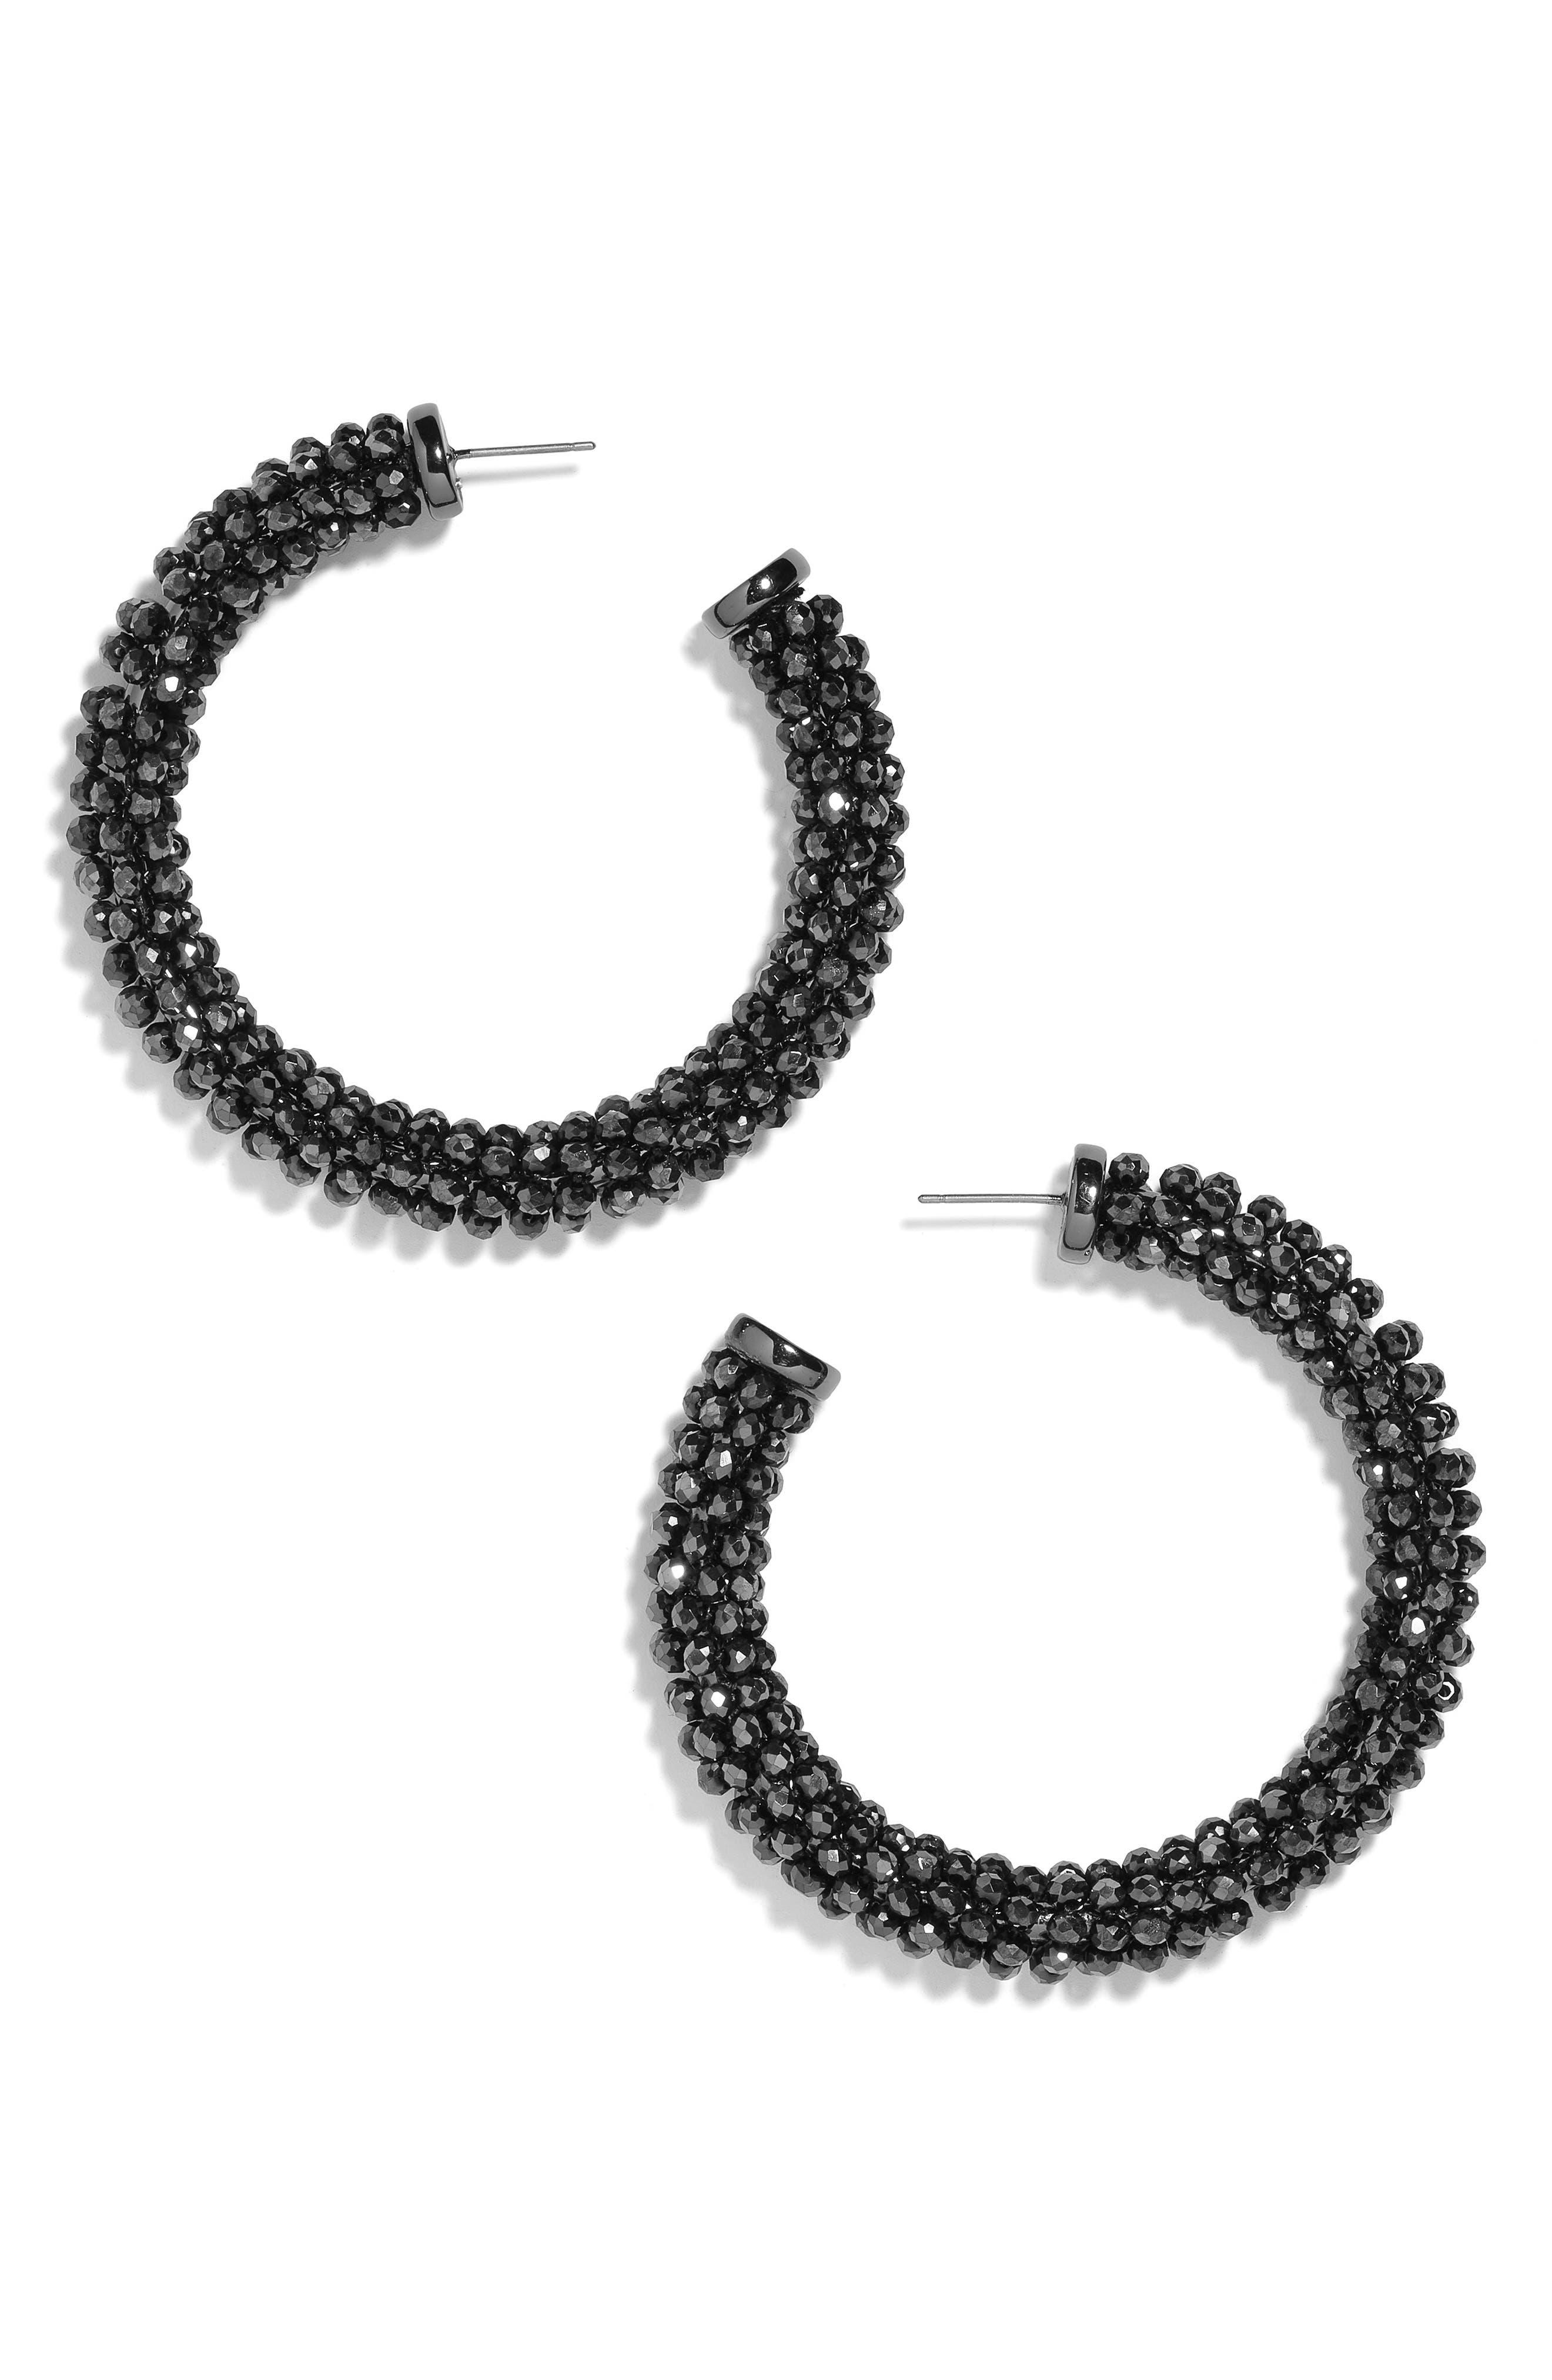 Danasia Faceted Beaded Hoop Earrings,                             Main thumbnail 1, color,                             BLACK